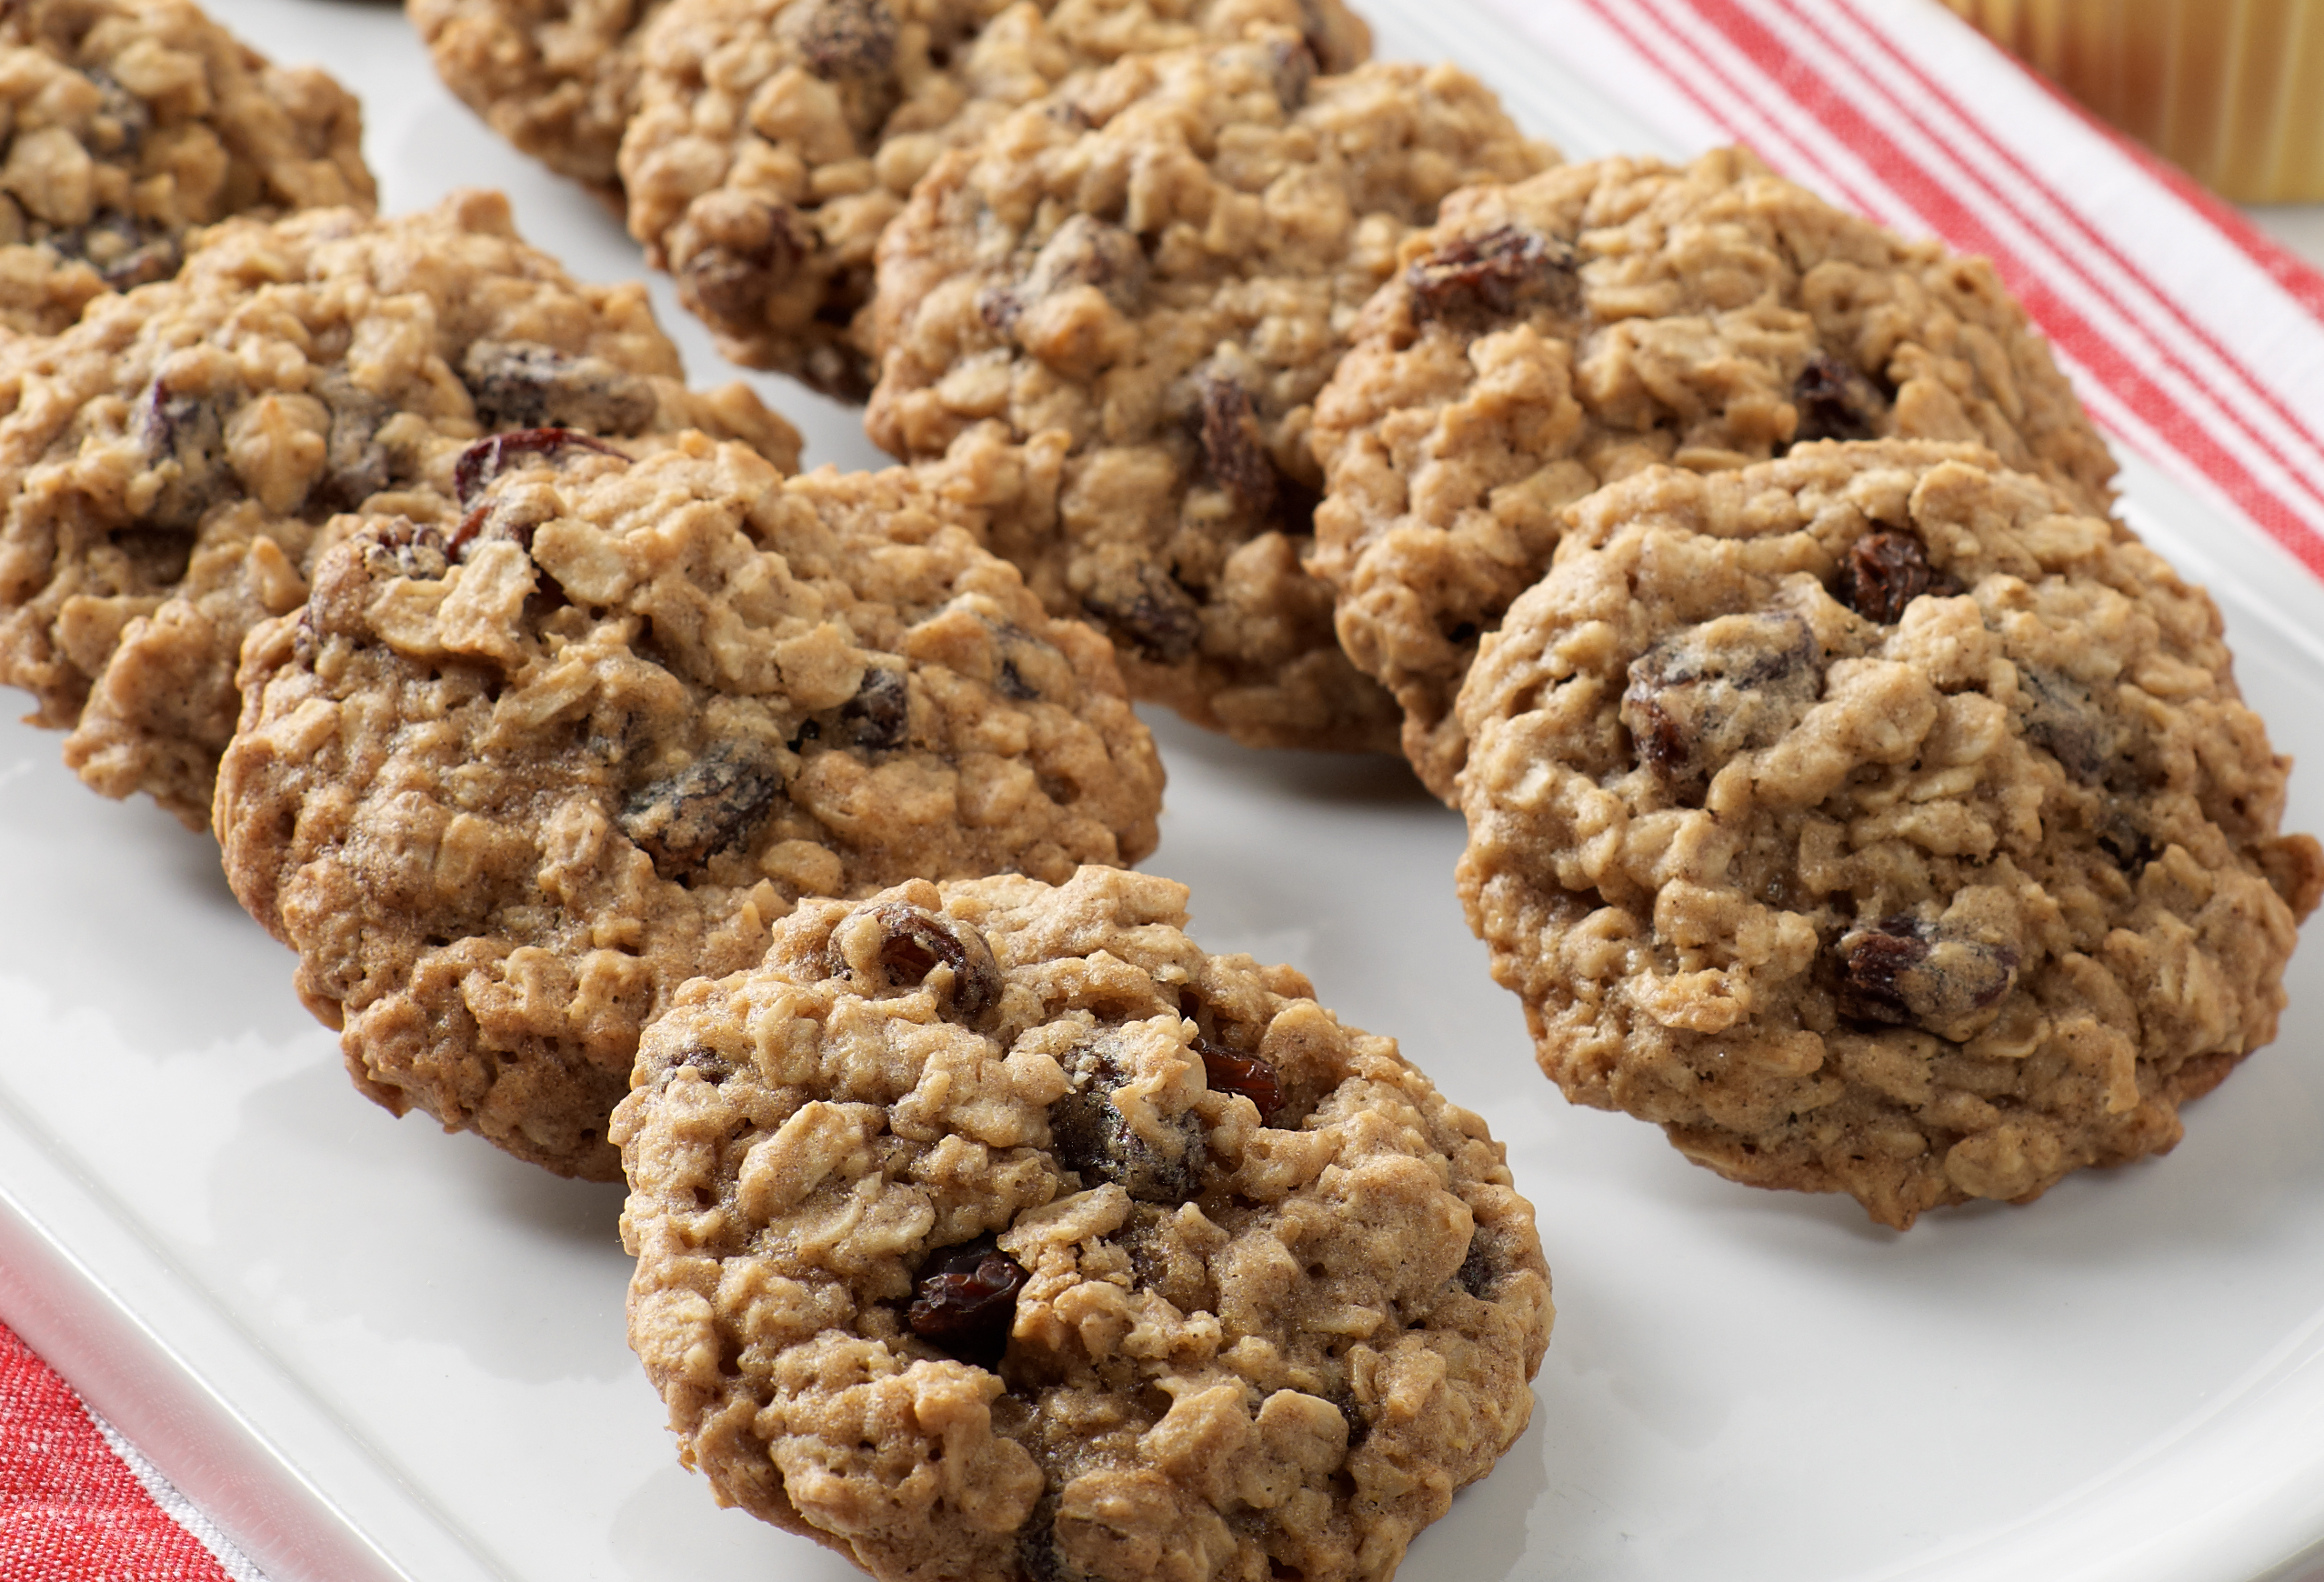 A plate of oatmeal raisin cookies